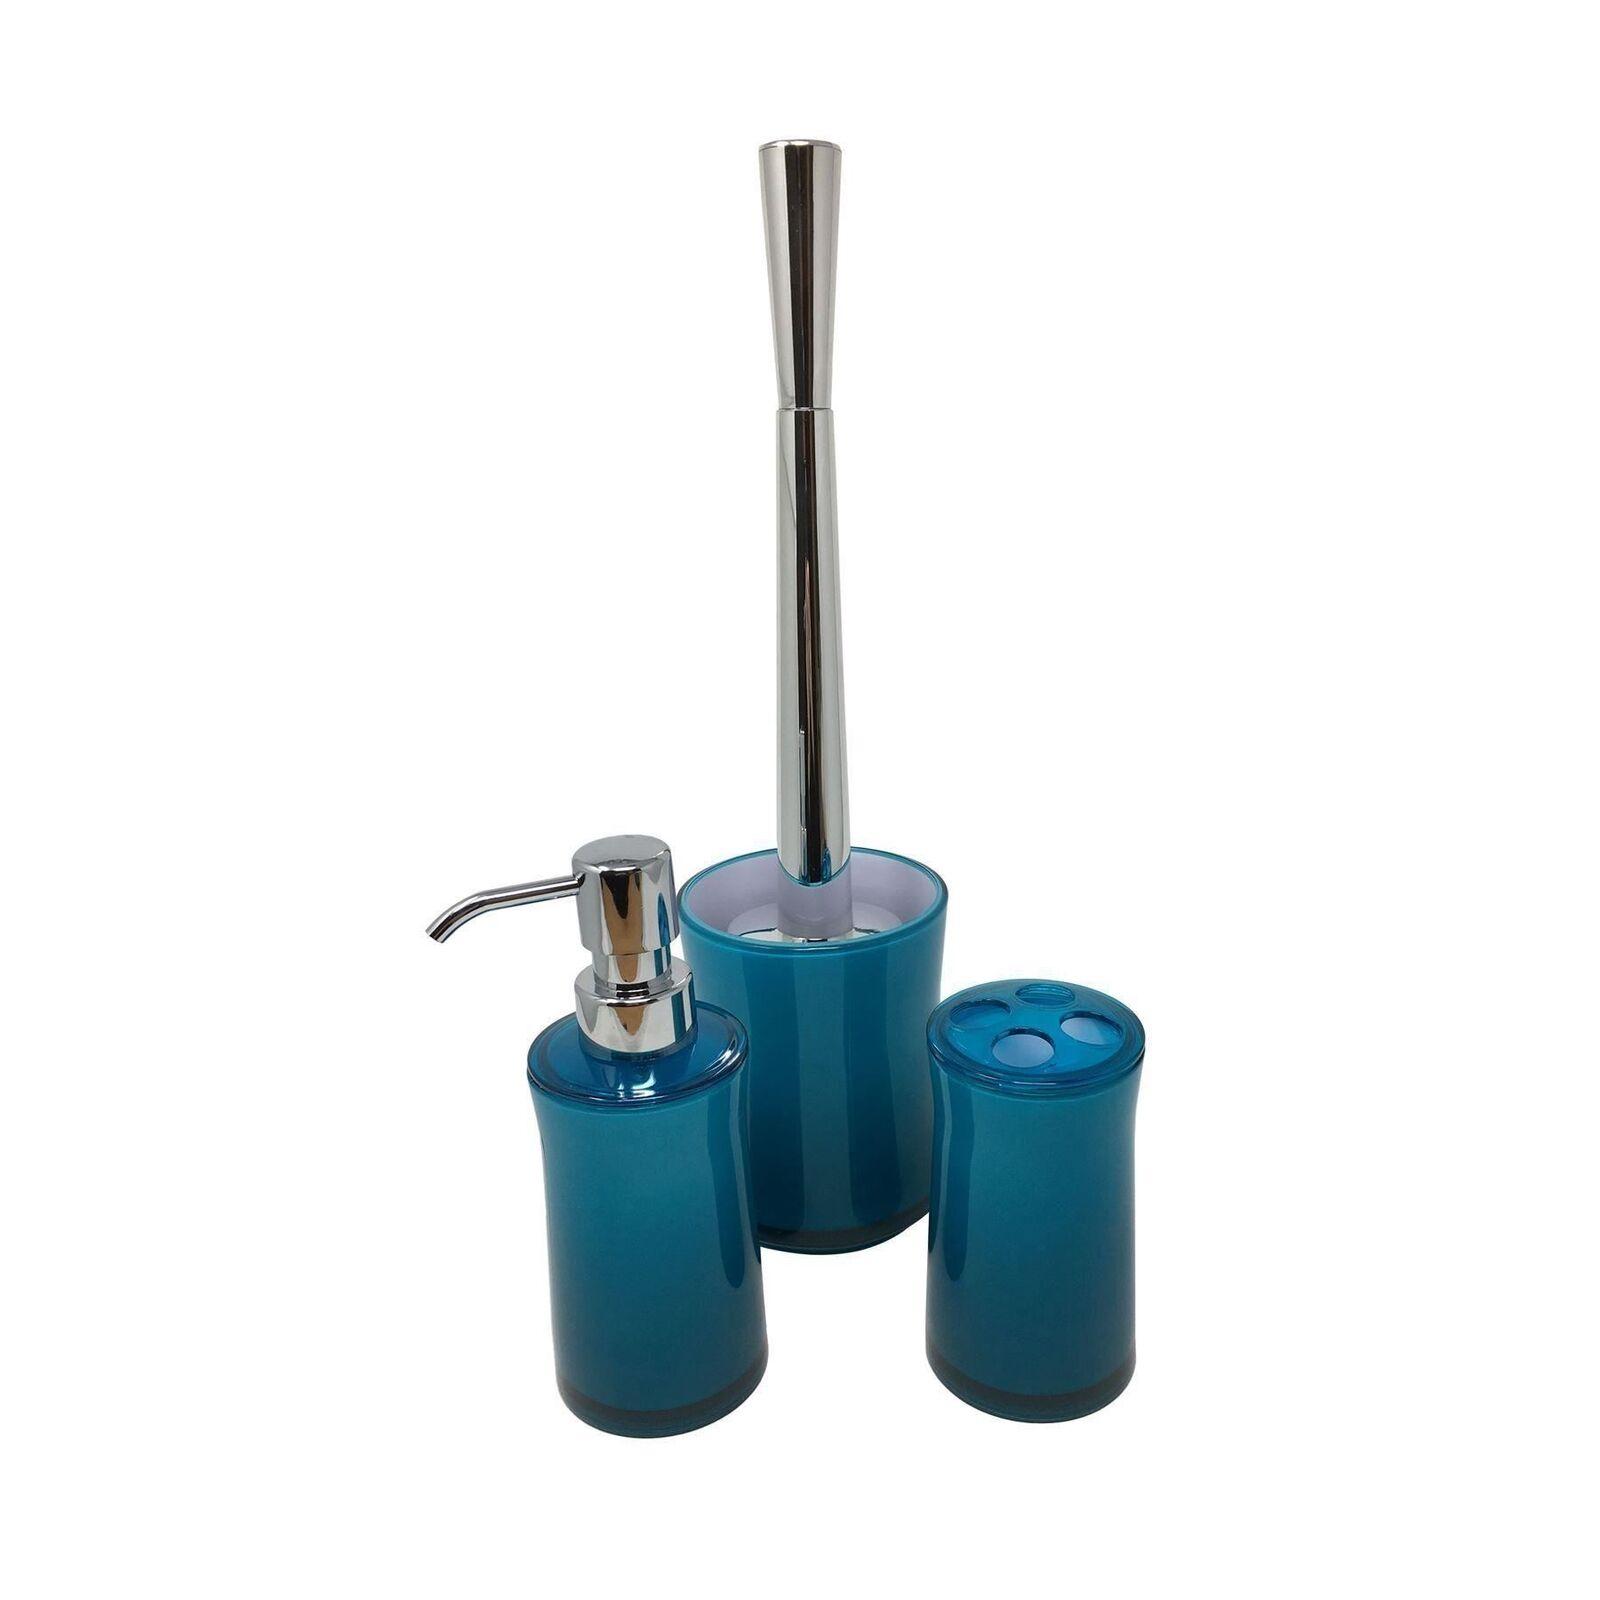 4x Plain Clear Teal bleu Bathroom Soap Distributeur Toothbrush toilettes Brush & Holders